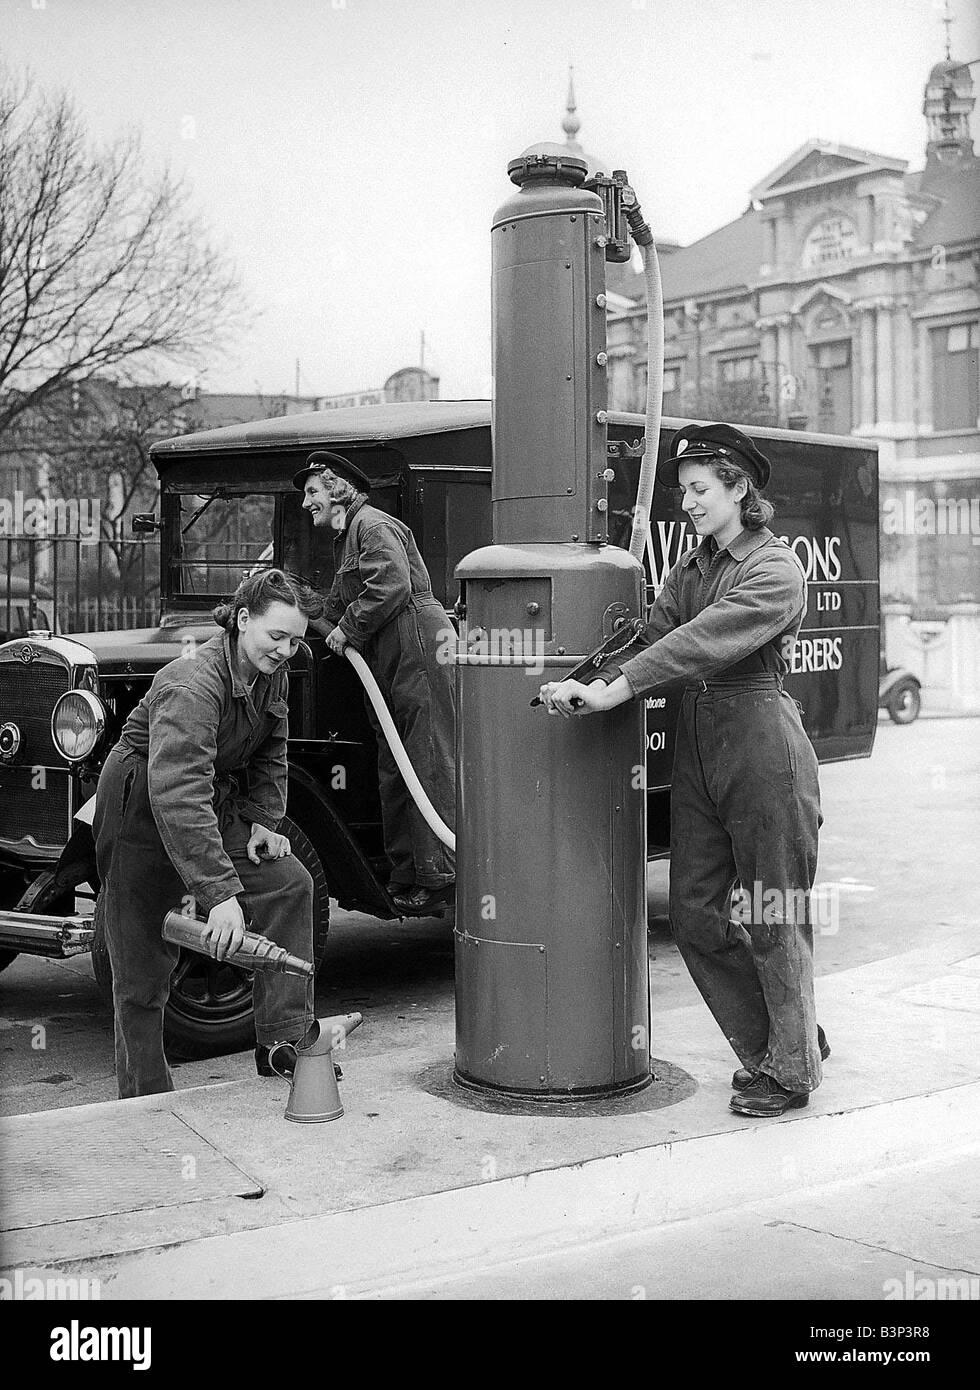 Women Garage Workers filling van with petrol in 1941 women doing mens jobs during the war years Women at War WW2 - Stock Image